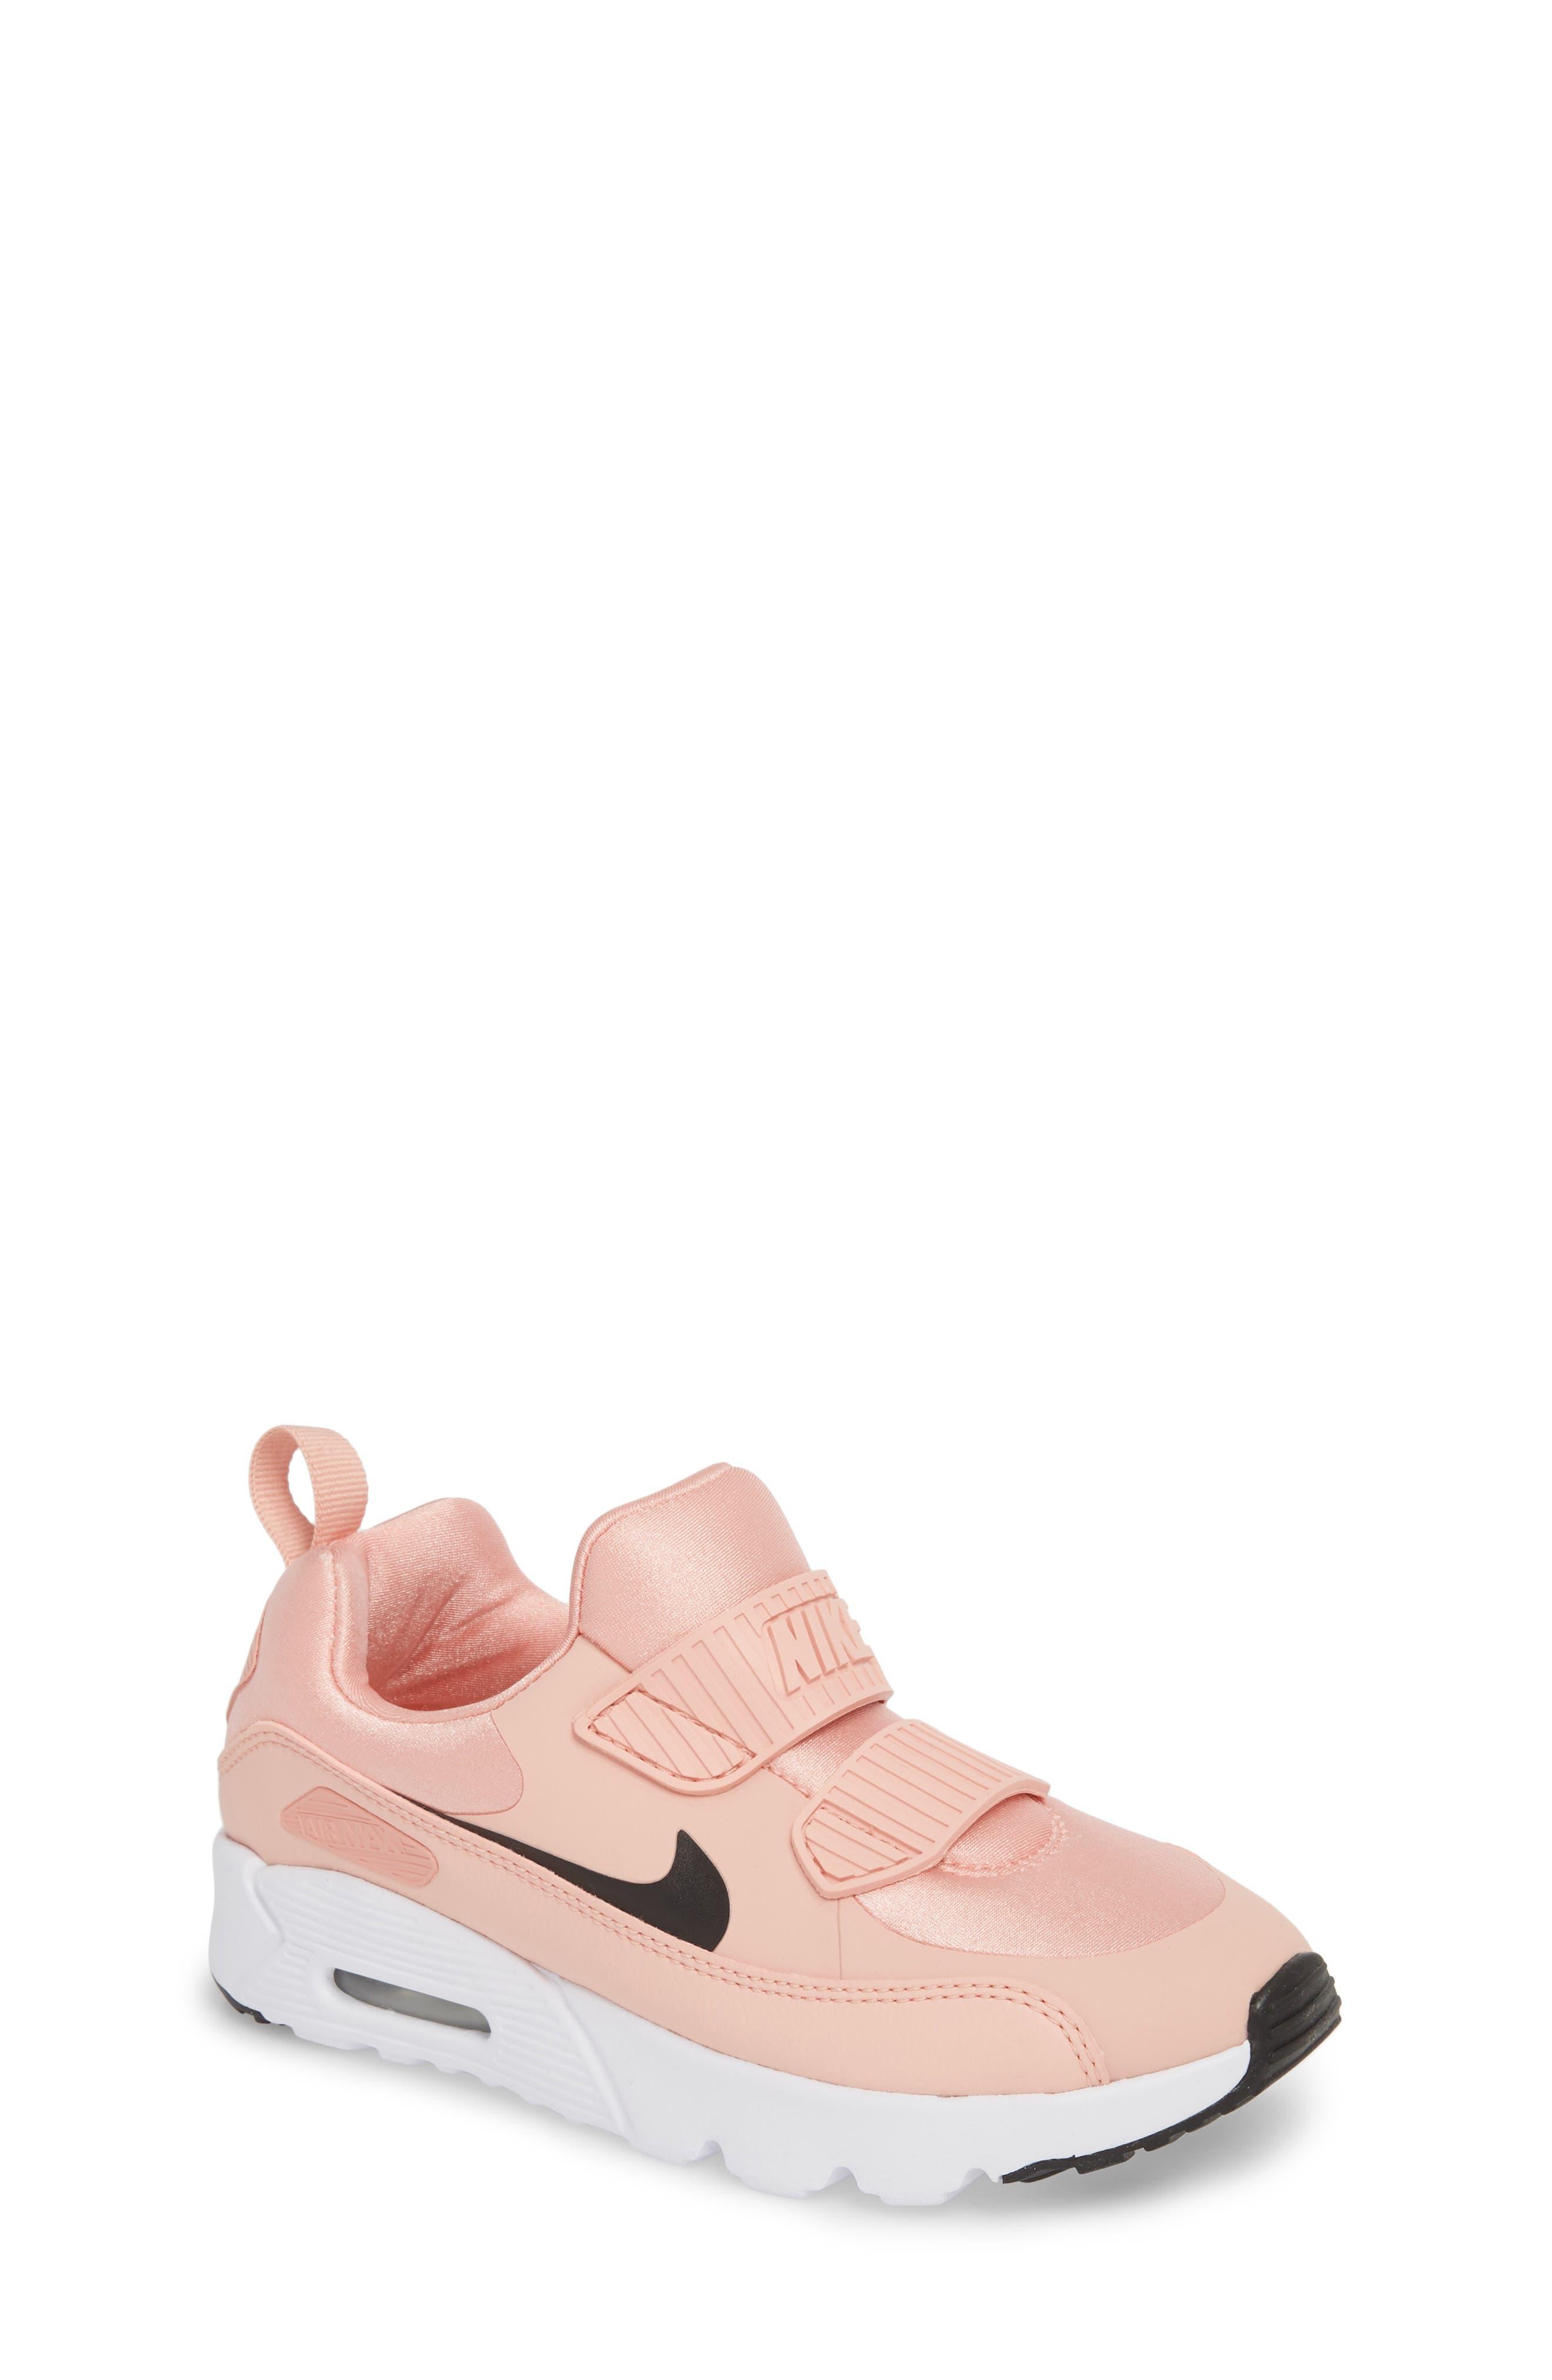 Air Max Tiny 90 Sneaker,                         Main,                         color, 955